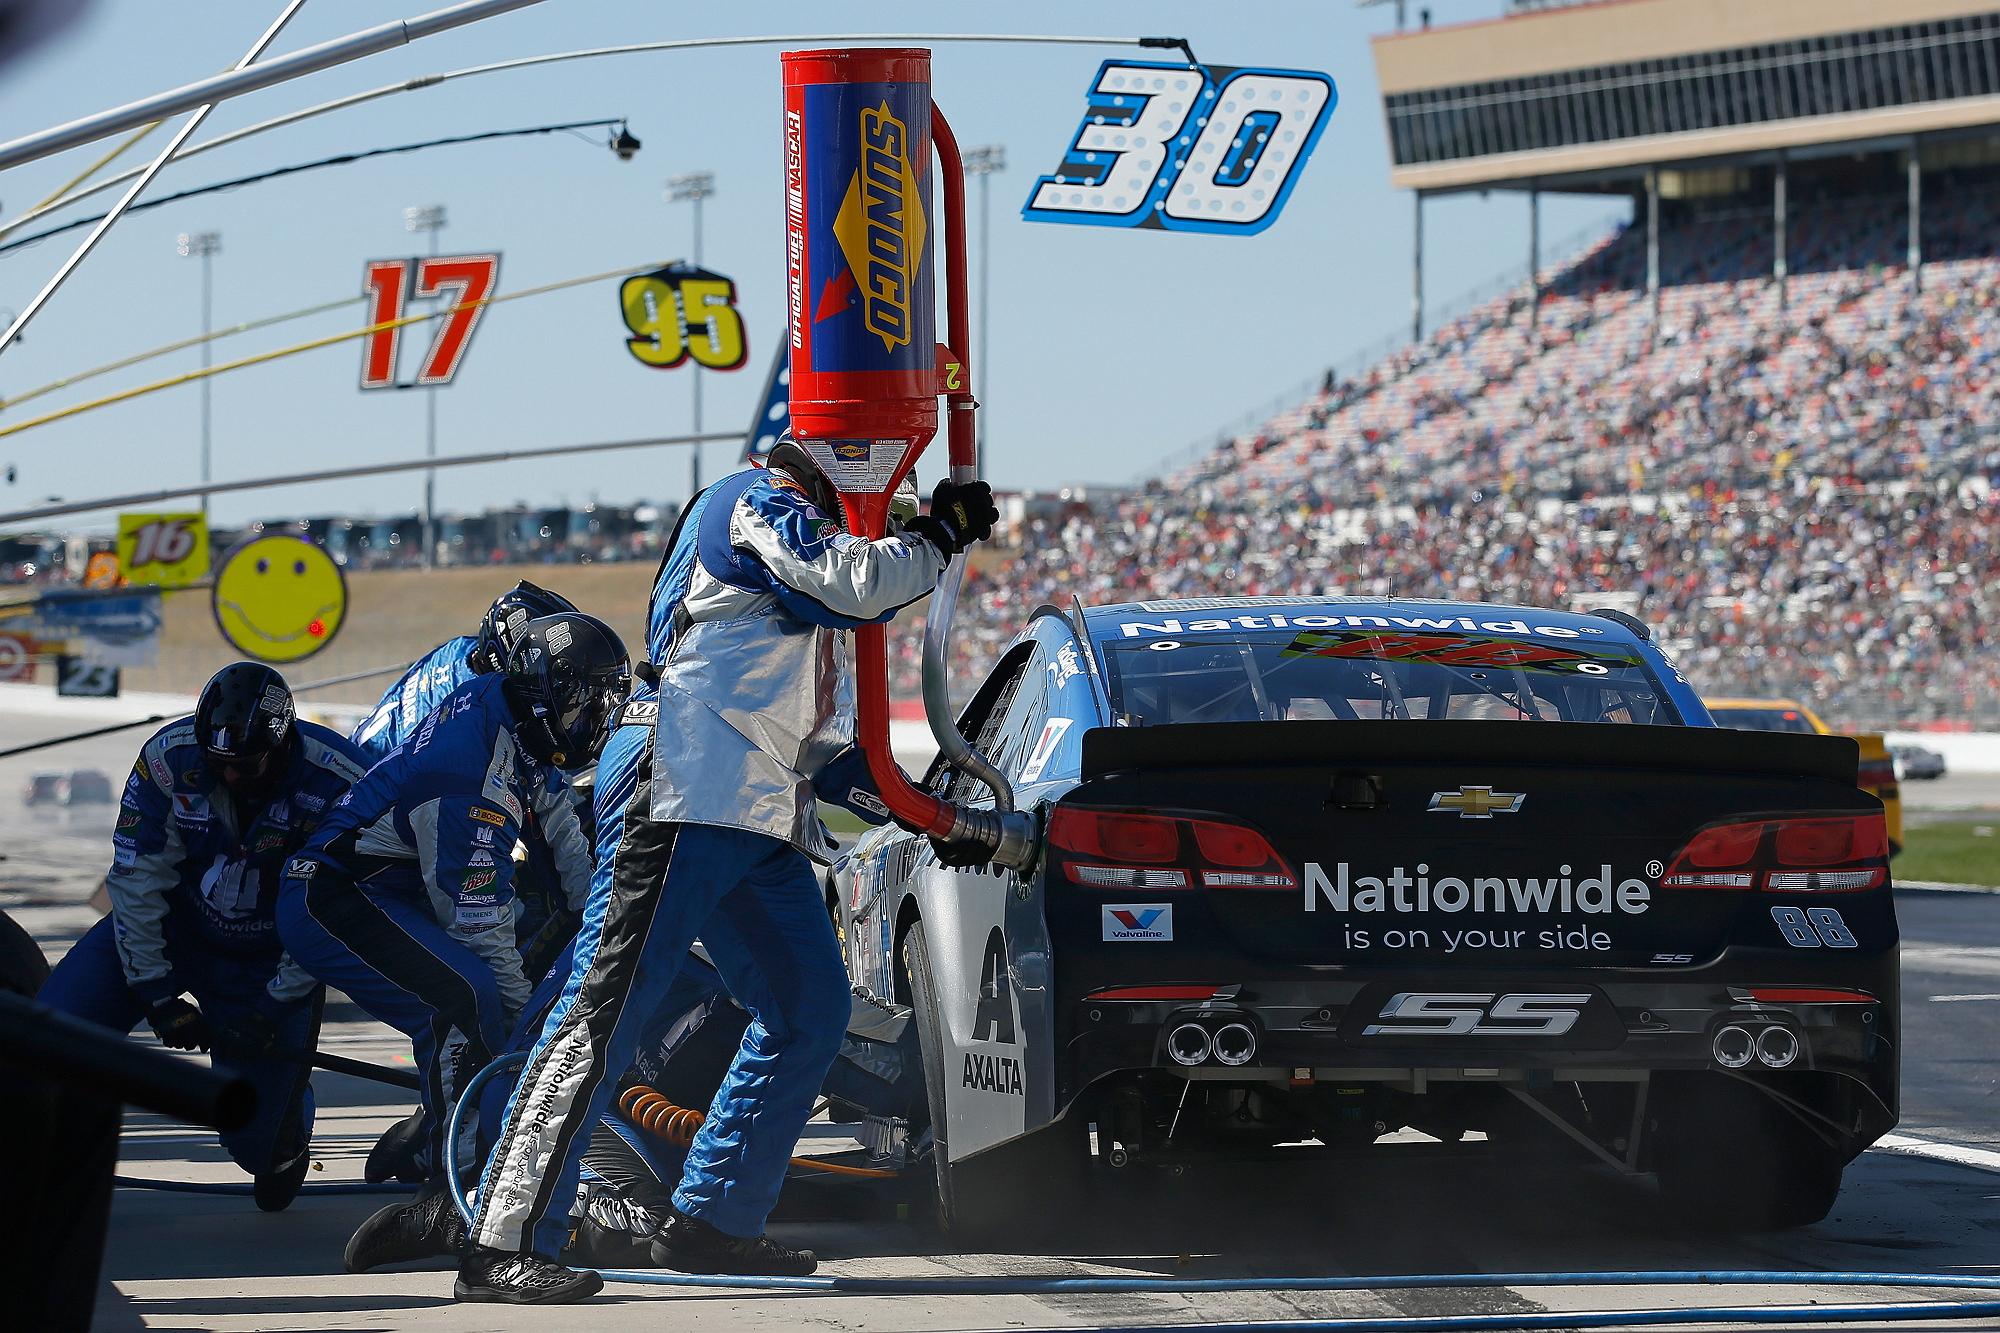 a Nationwide NASCAR